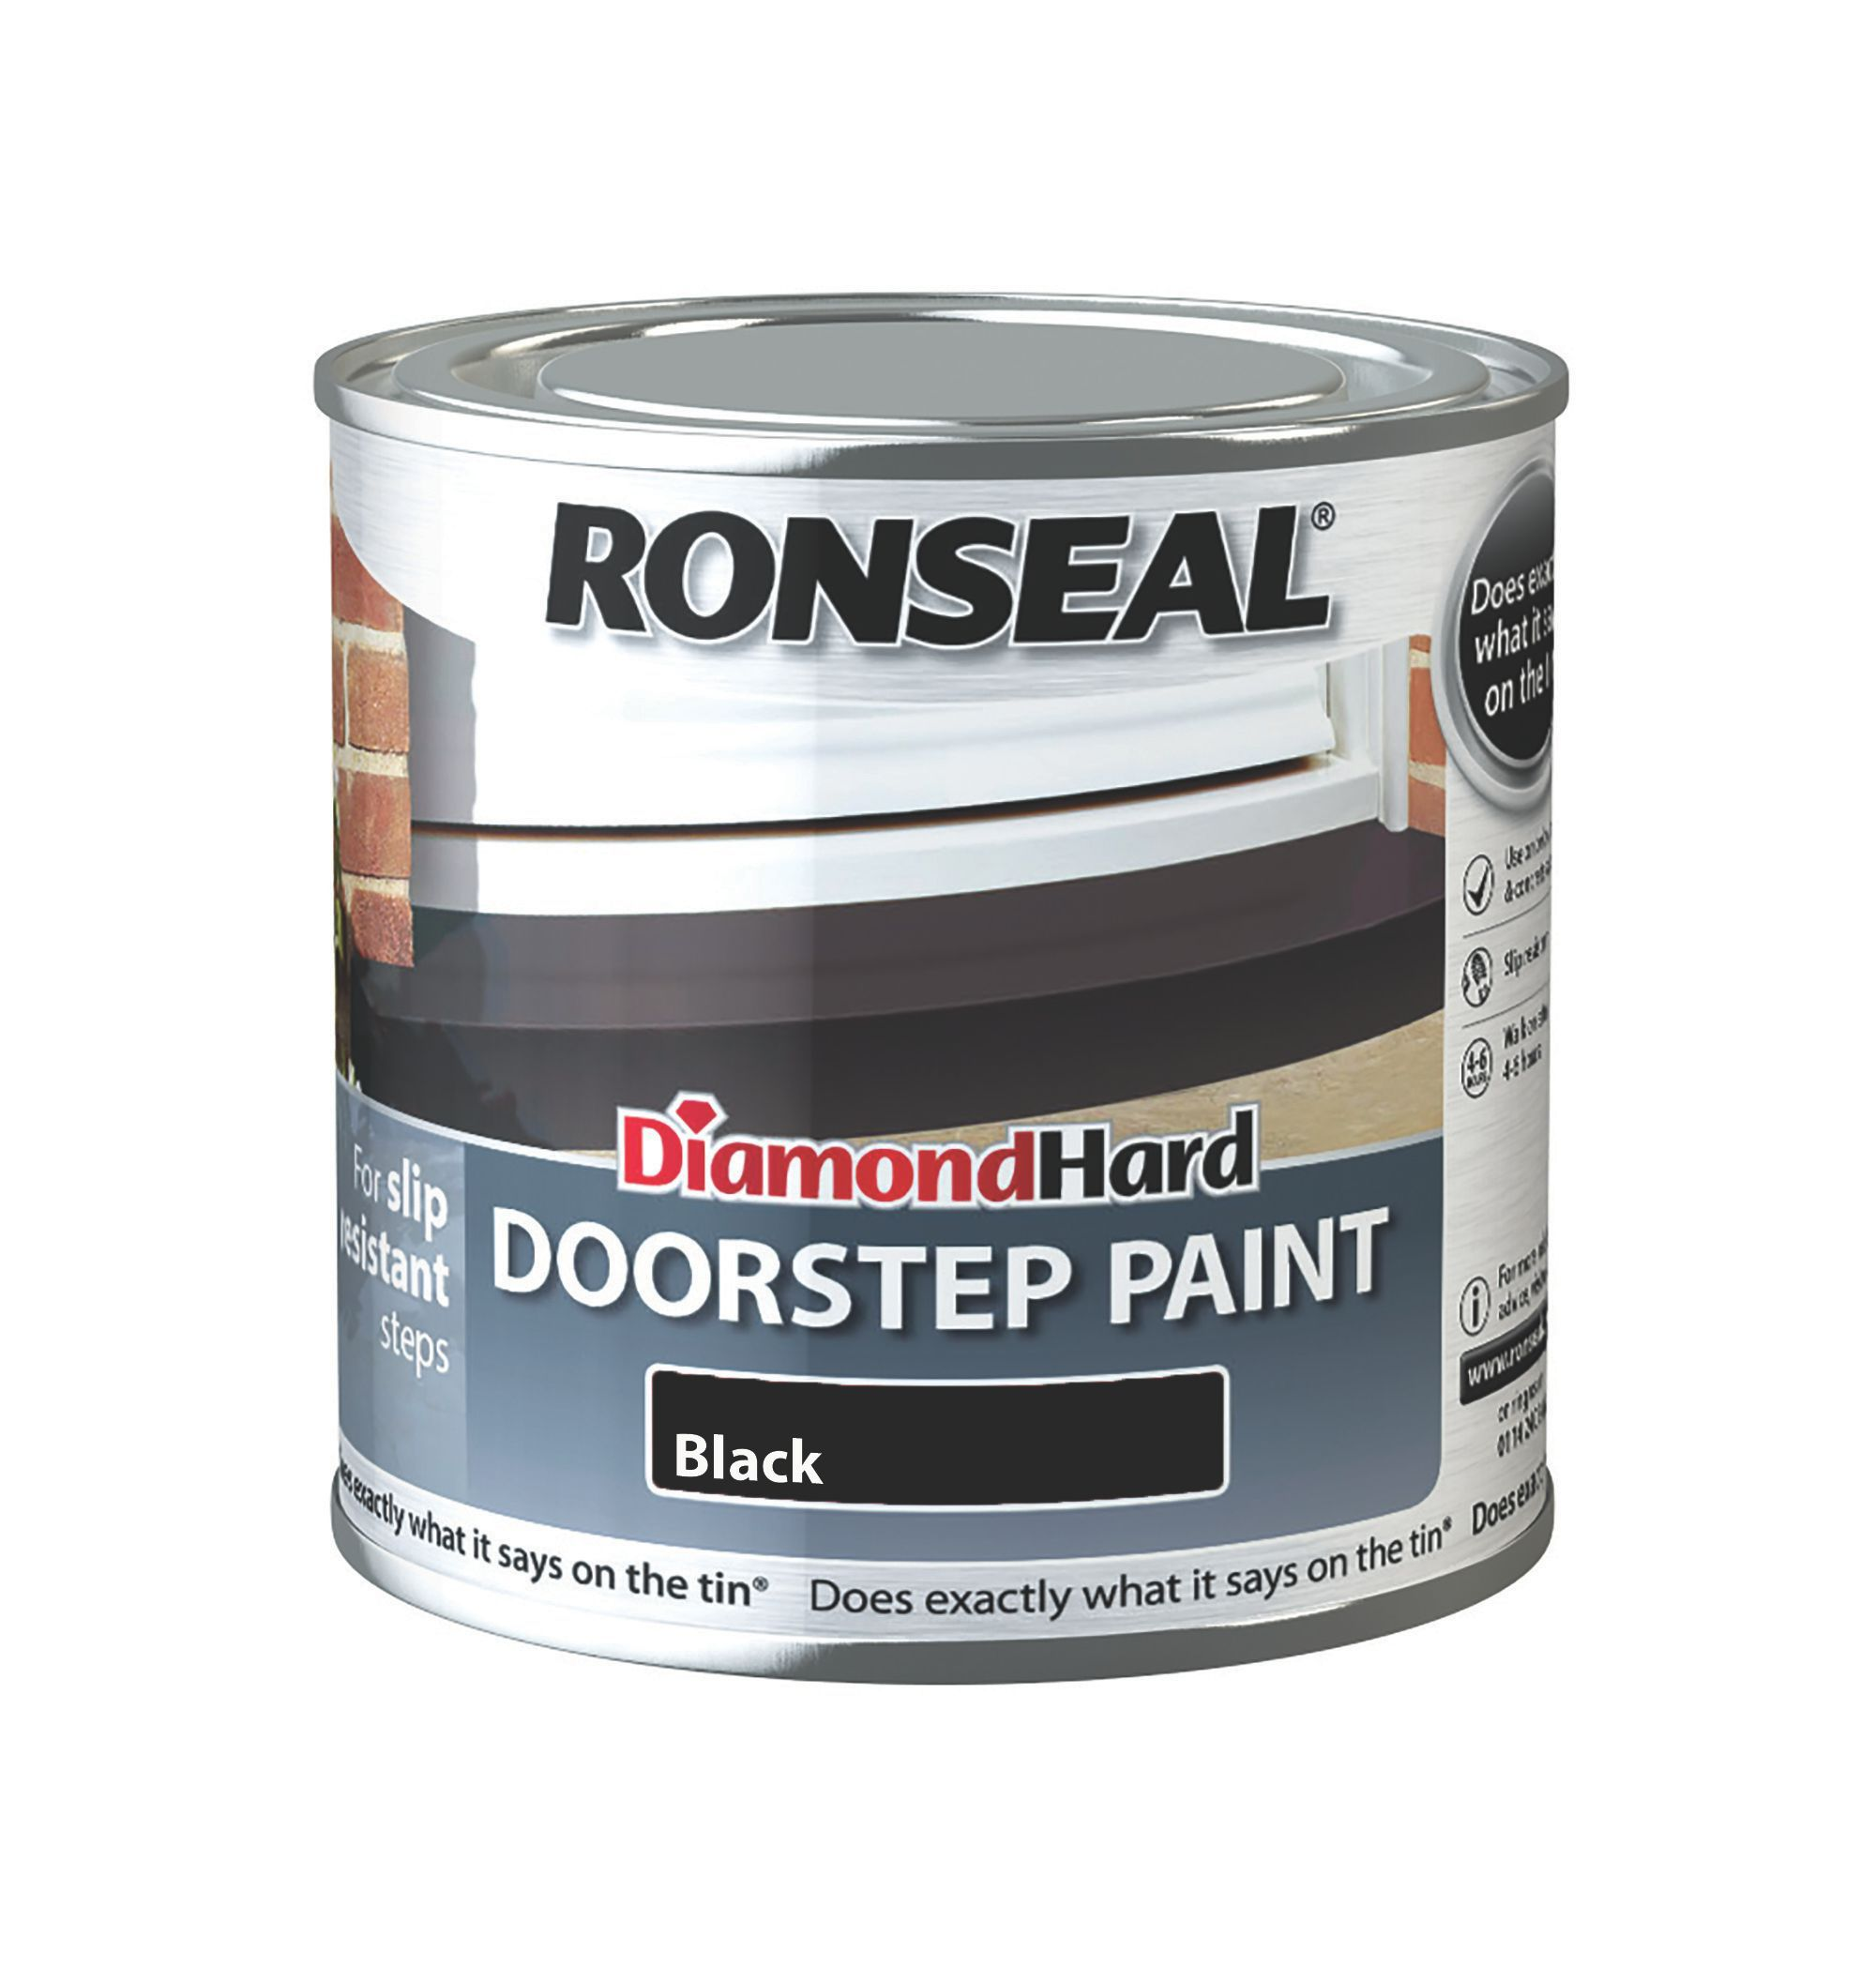 Ronseal Doorstep Paint Black Satin Doorstep Paint0 25l